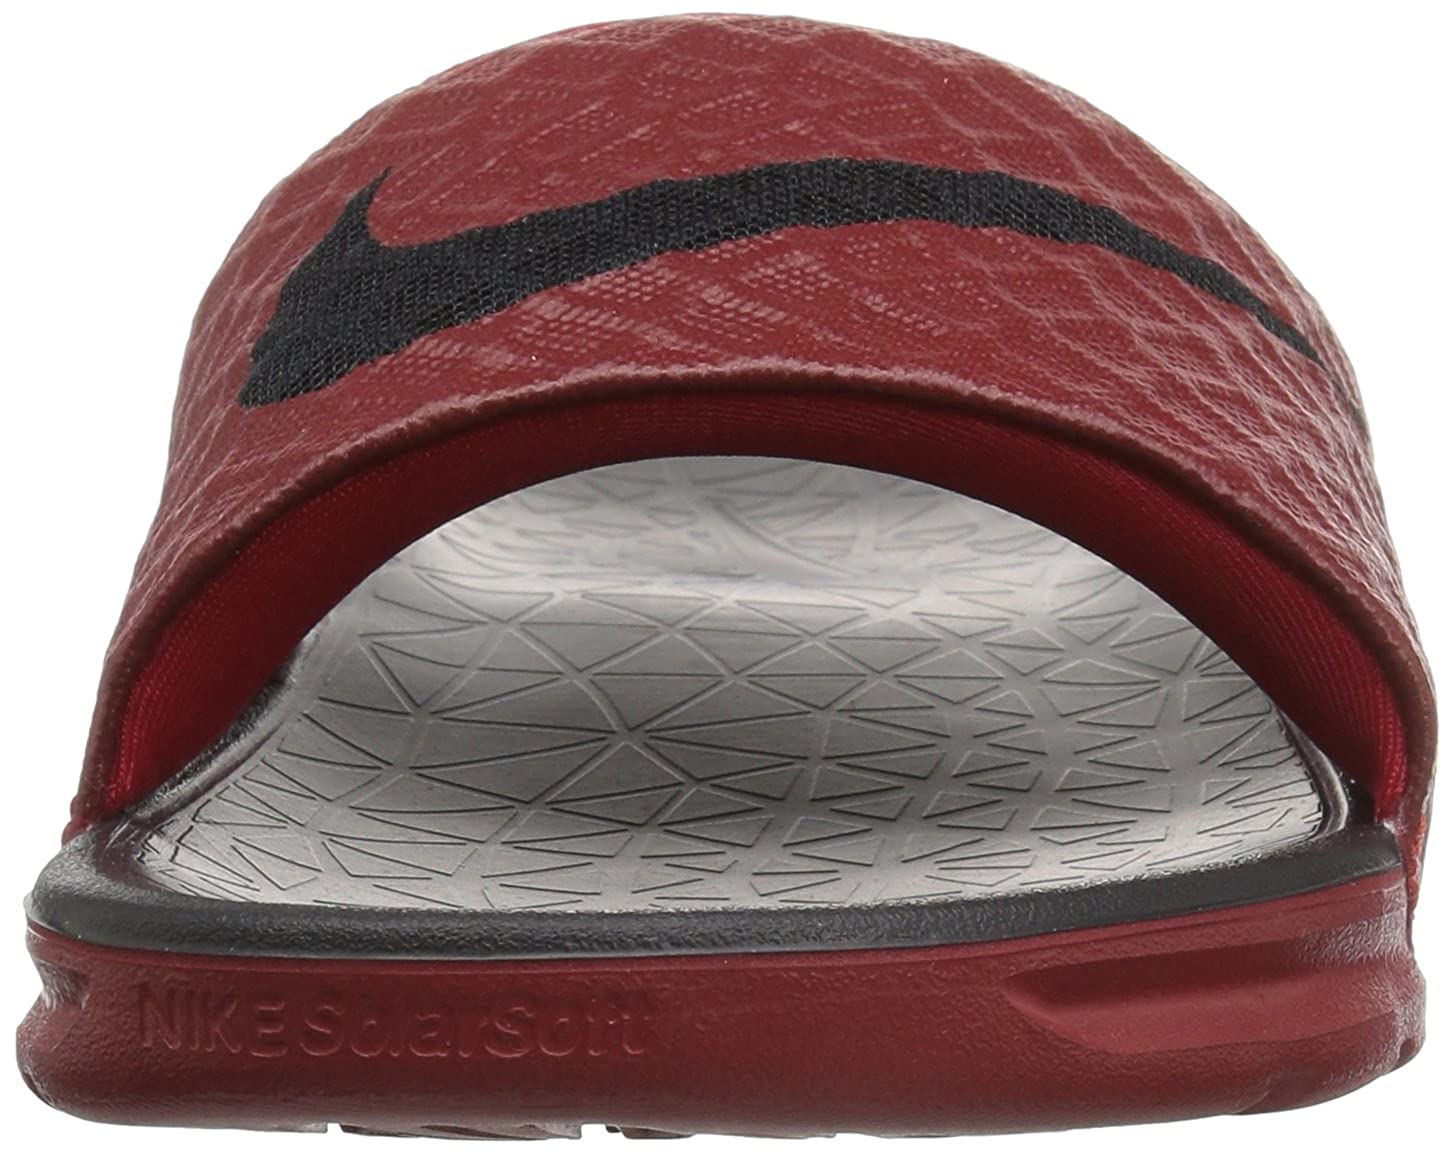 0816e936dfc3 Nike New Men s Benassi Solarsoft Slide Red Black 705474 600 size 16   Amazon.ca  Shoes   Handbags